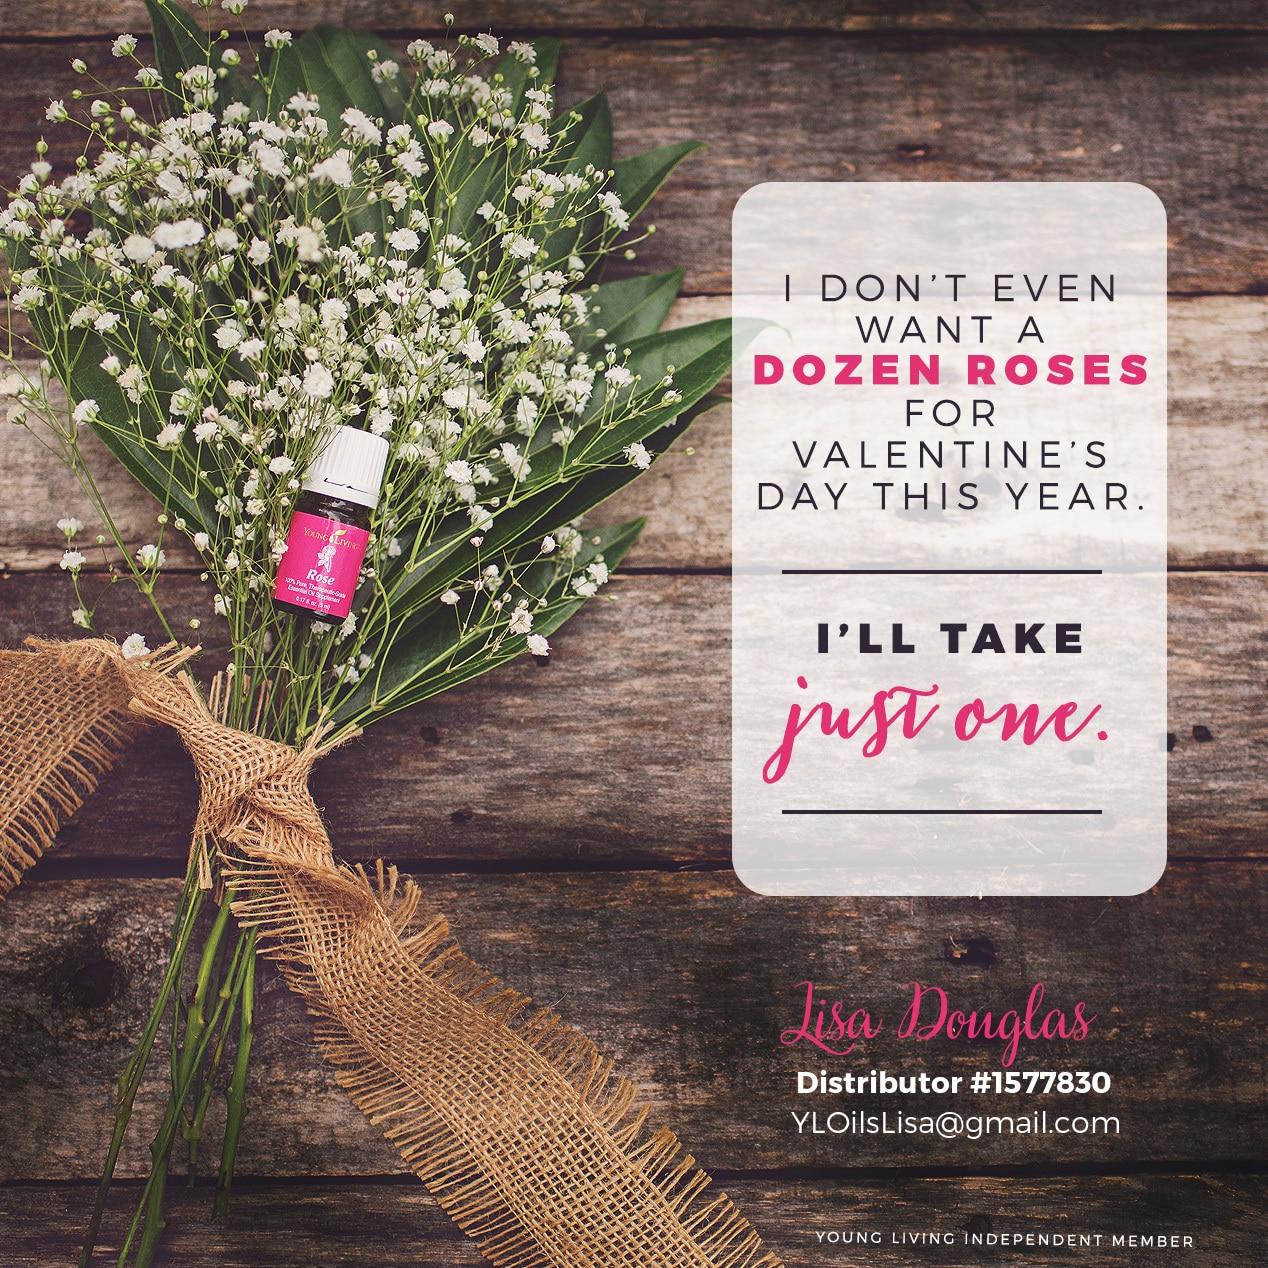 Rose Oil for Valentine's Day